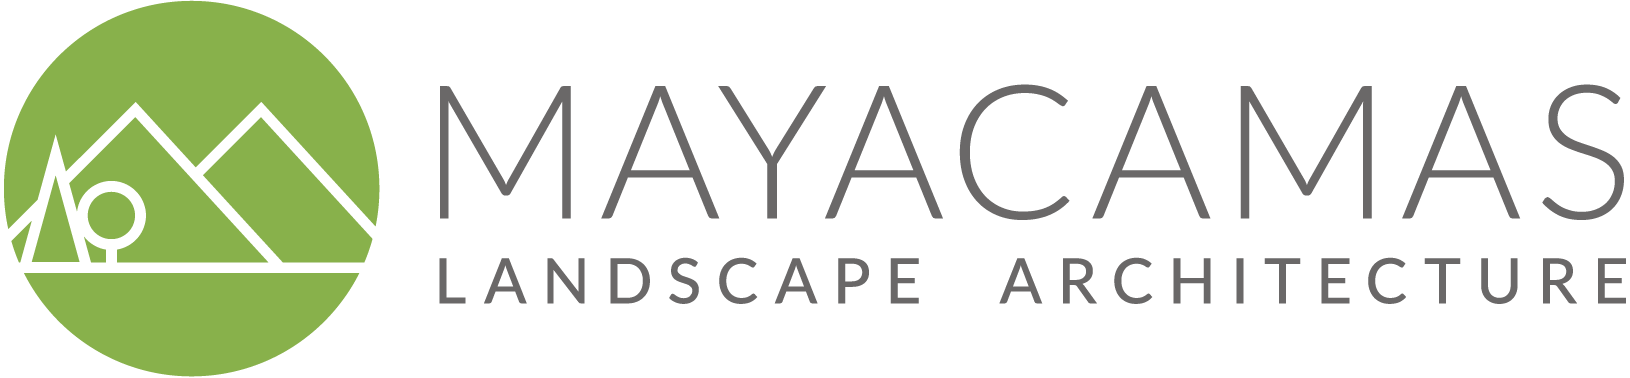 Mayacamas Landscape Architecture